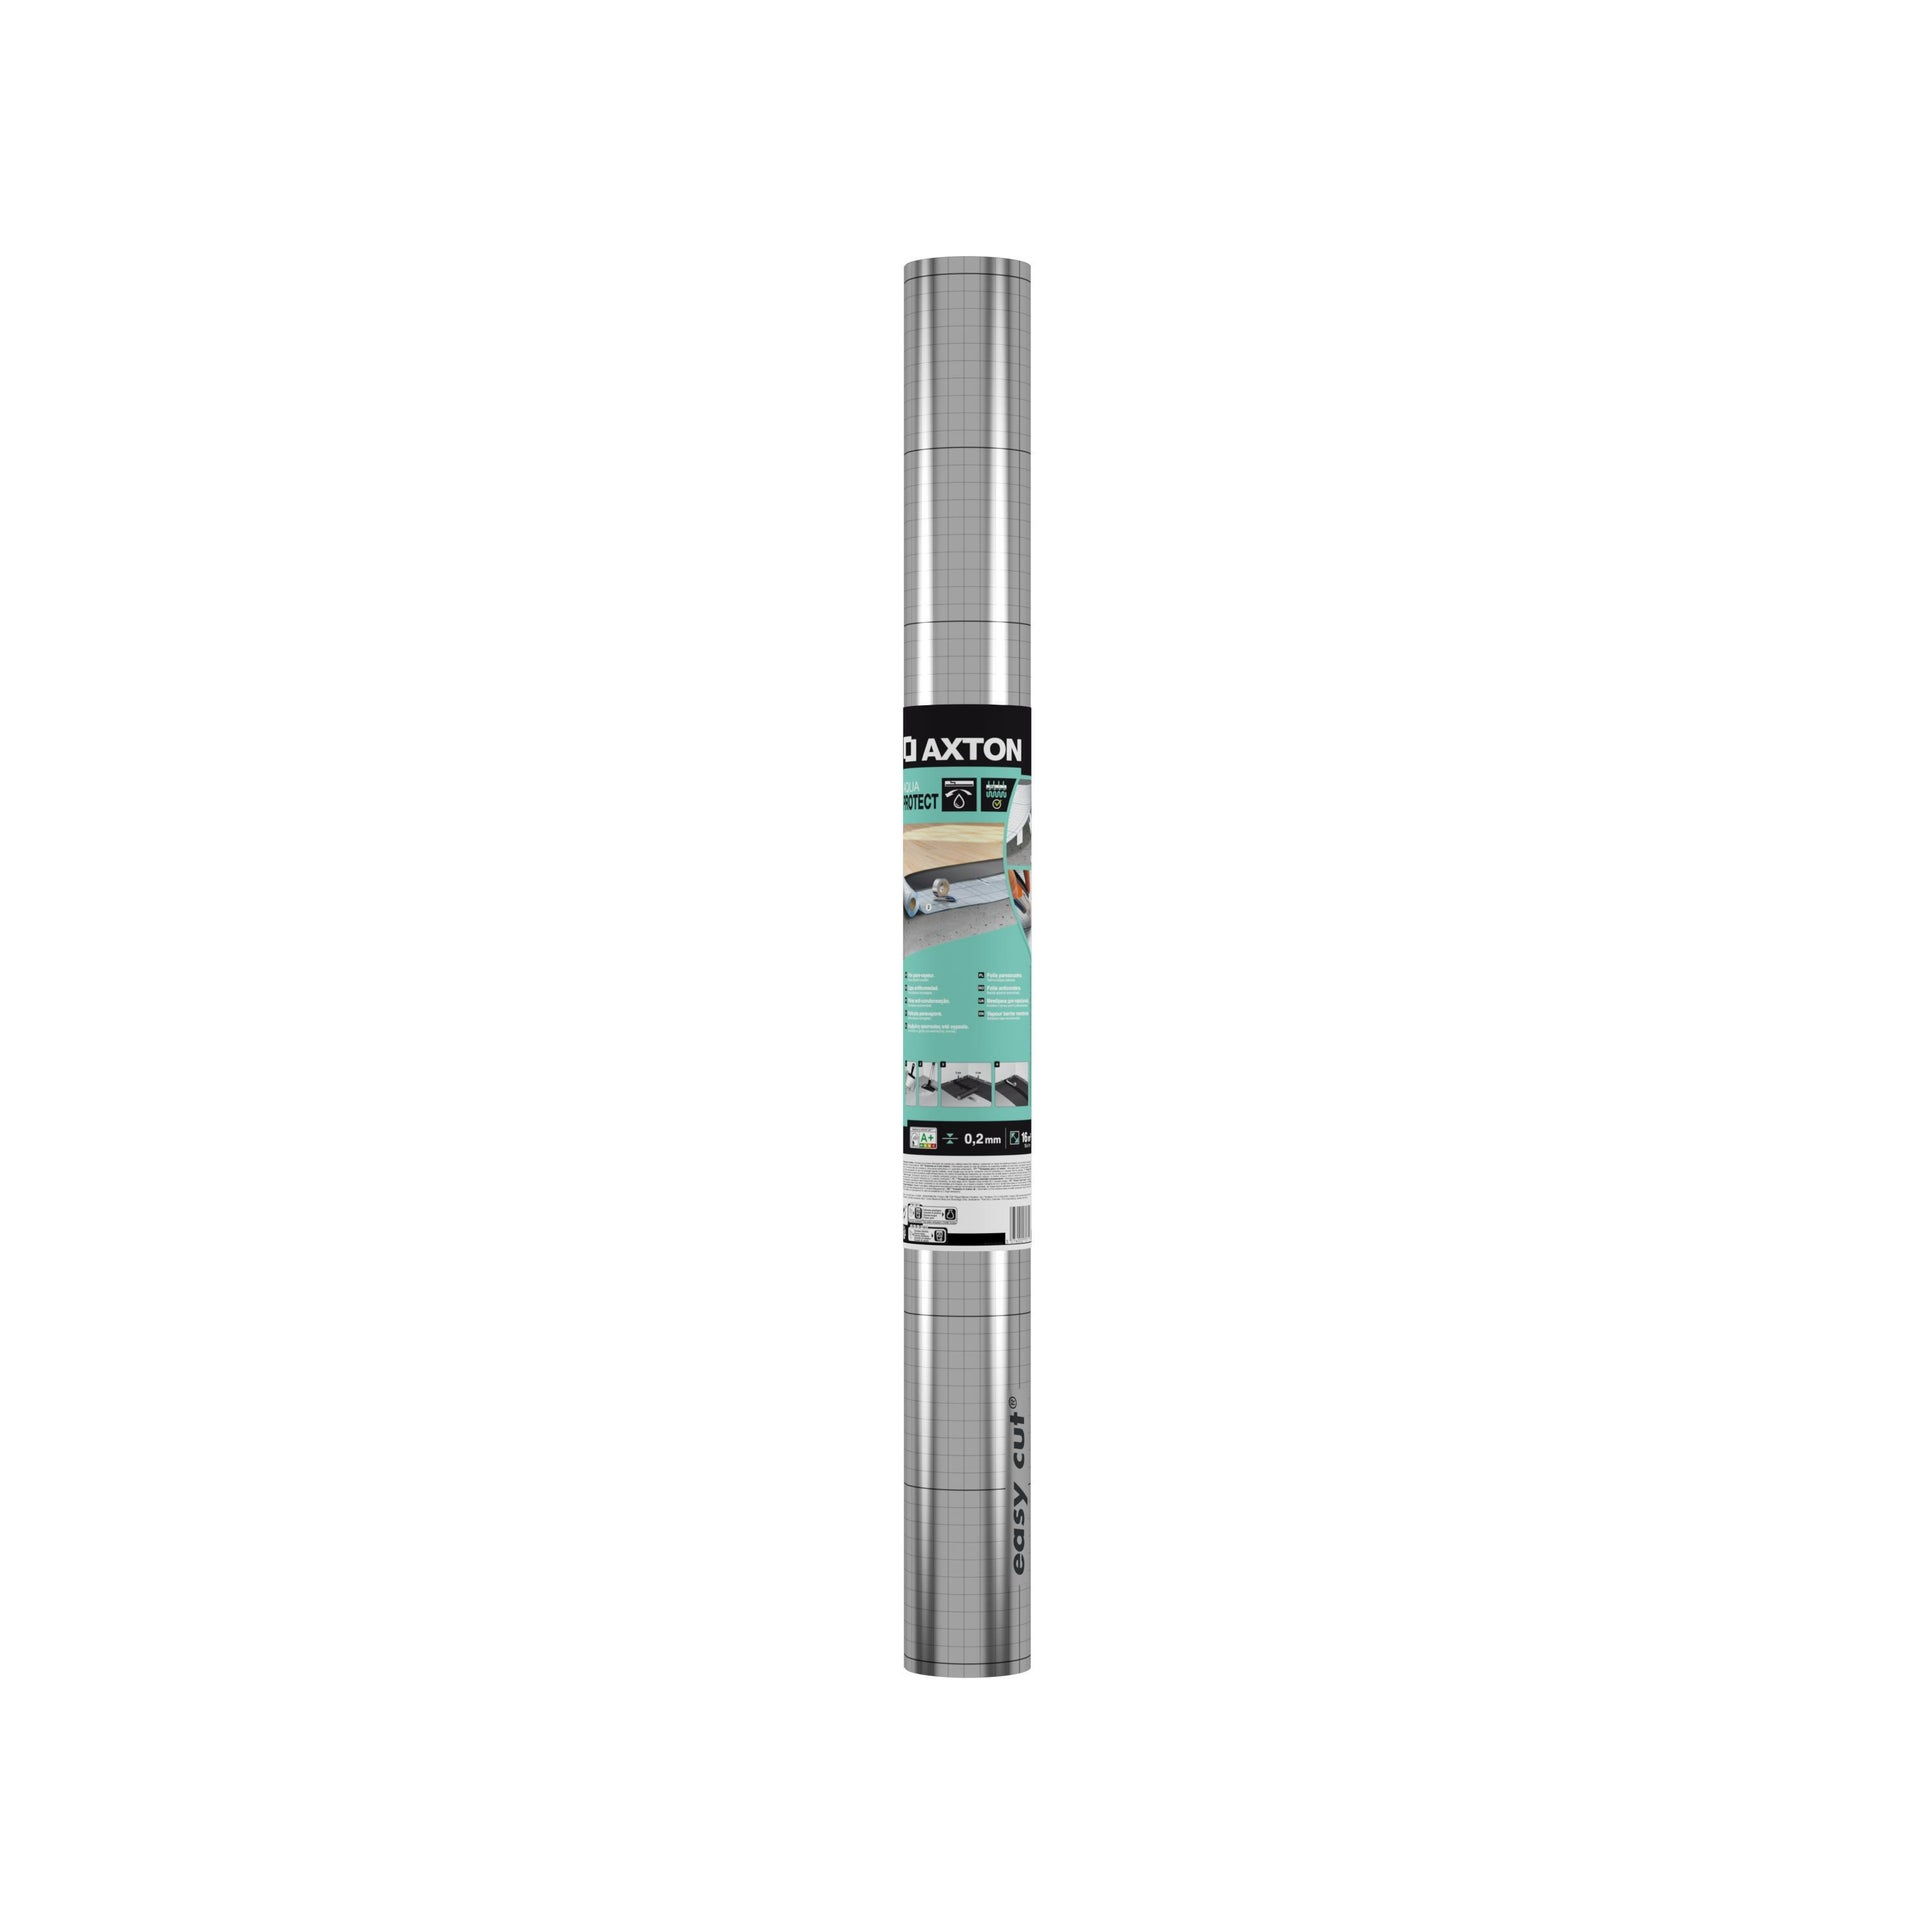 Sottopavimento AXTON Aqua Protect Sp 0.2 mm - 7